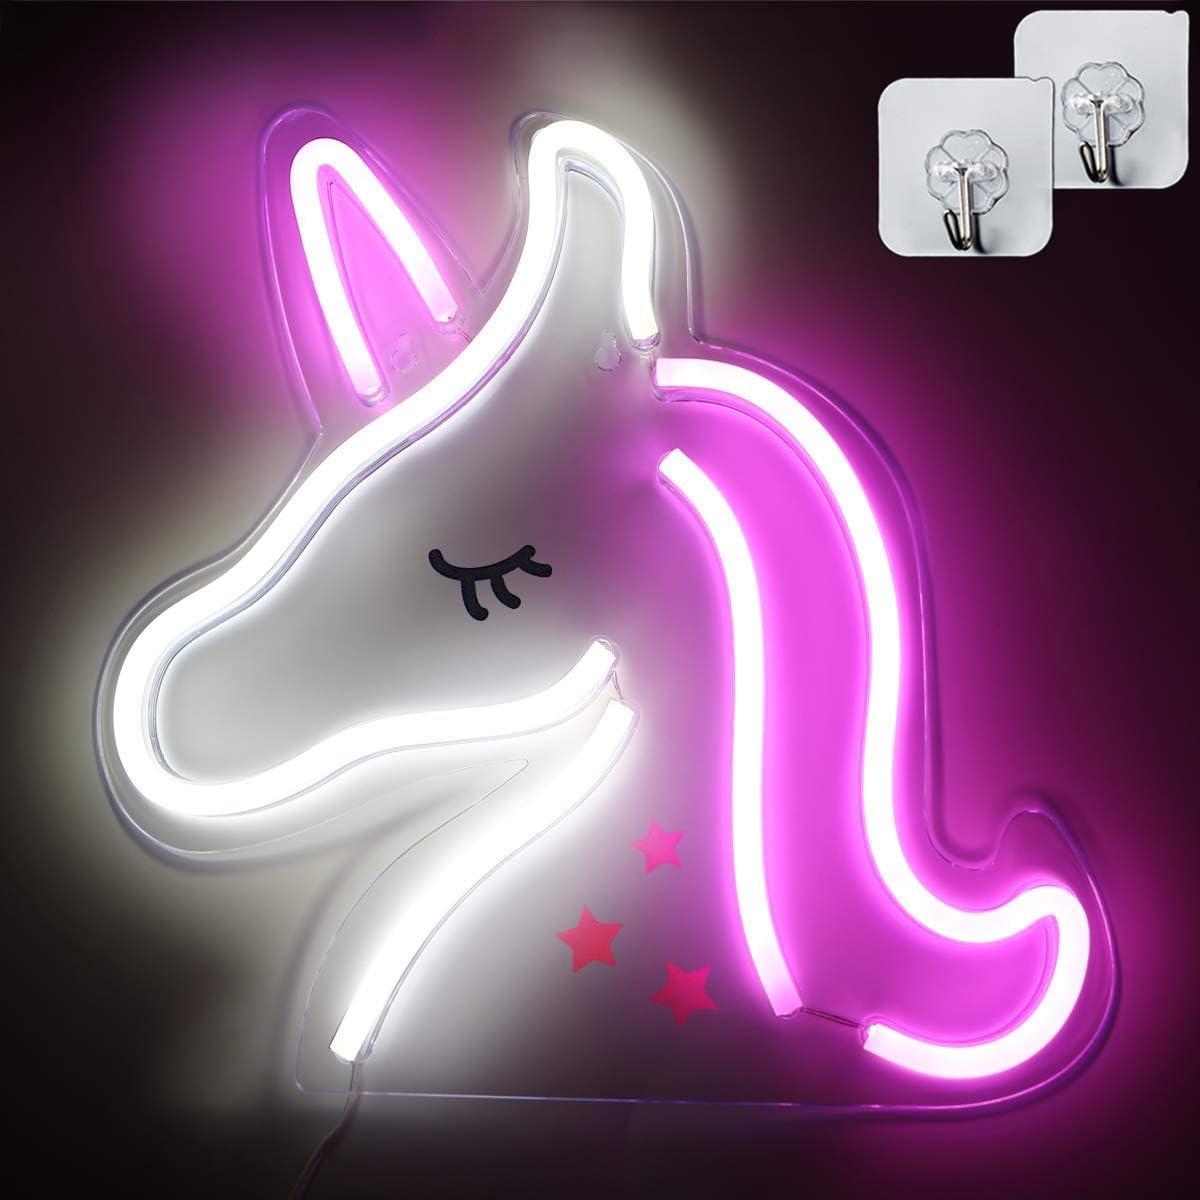 Xiyunte Unicorn Neon Signs Led Unicorn Lights Acrylic Neon Light Wall Decor Usb Operated Unicorn Signs Light Up For Kids Bedroom Bar Party Valentine S Day Wedding With Two Hooks Amazon Com